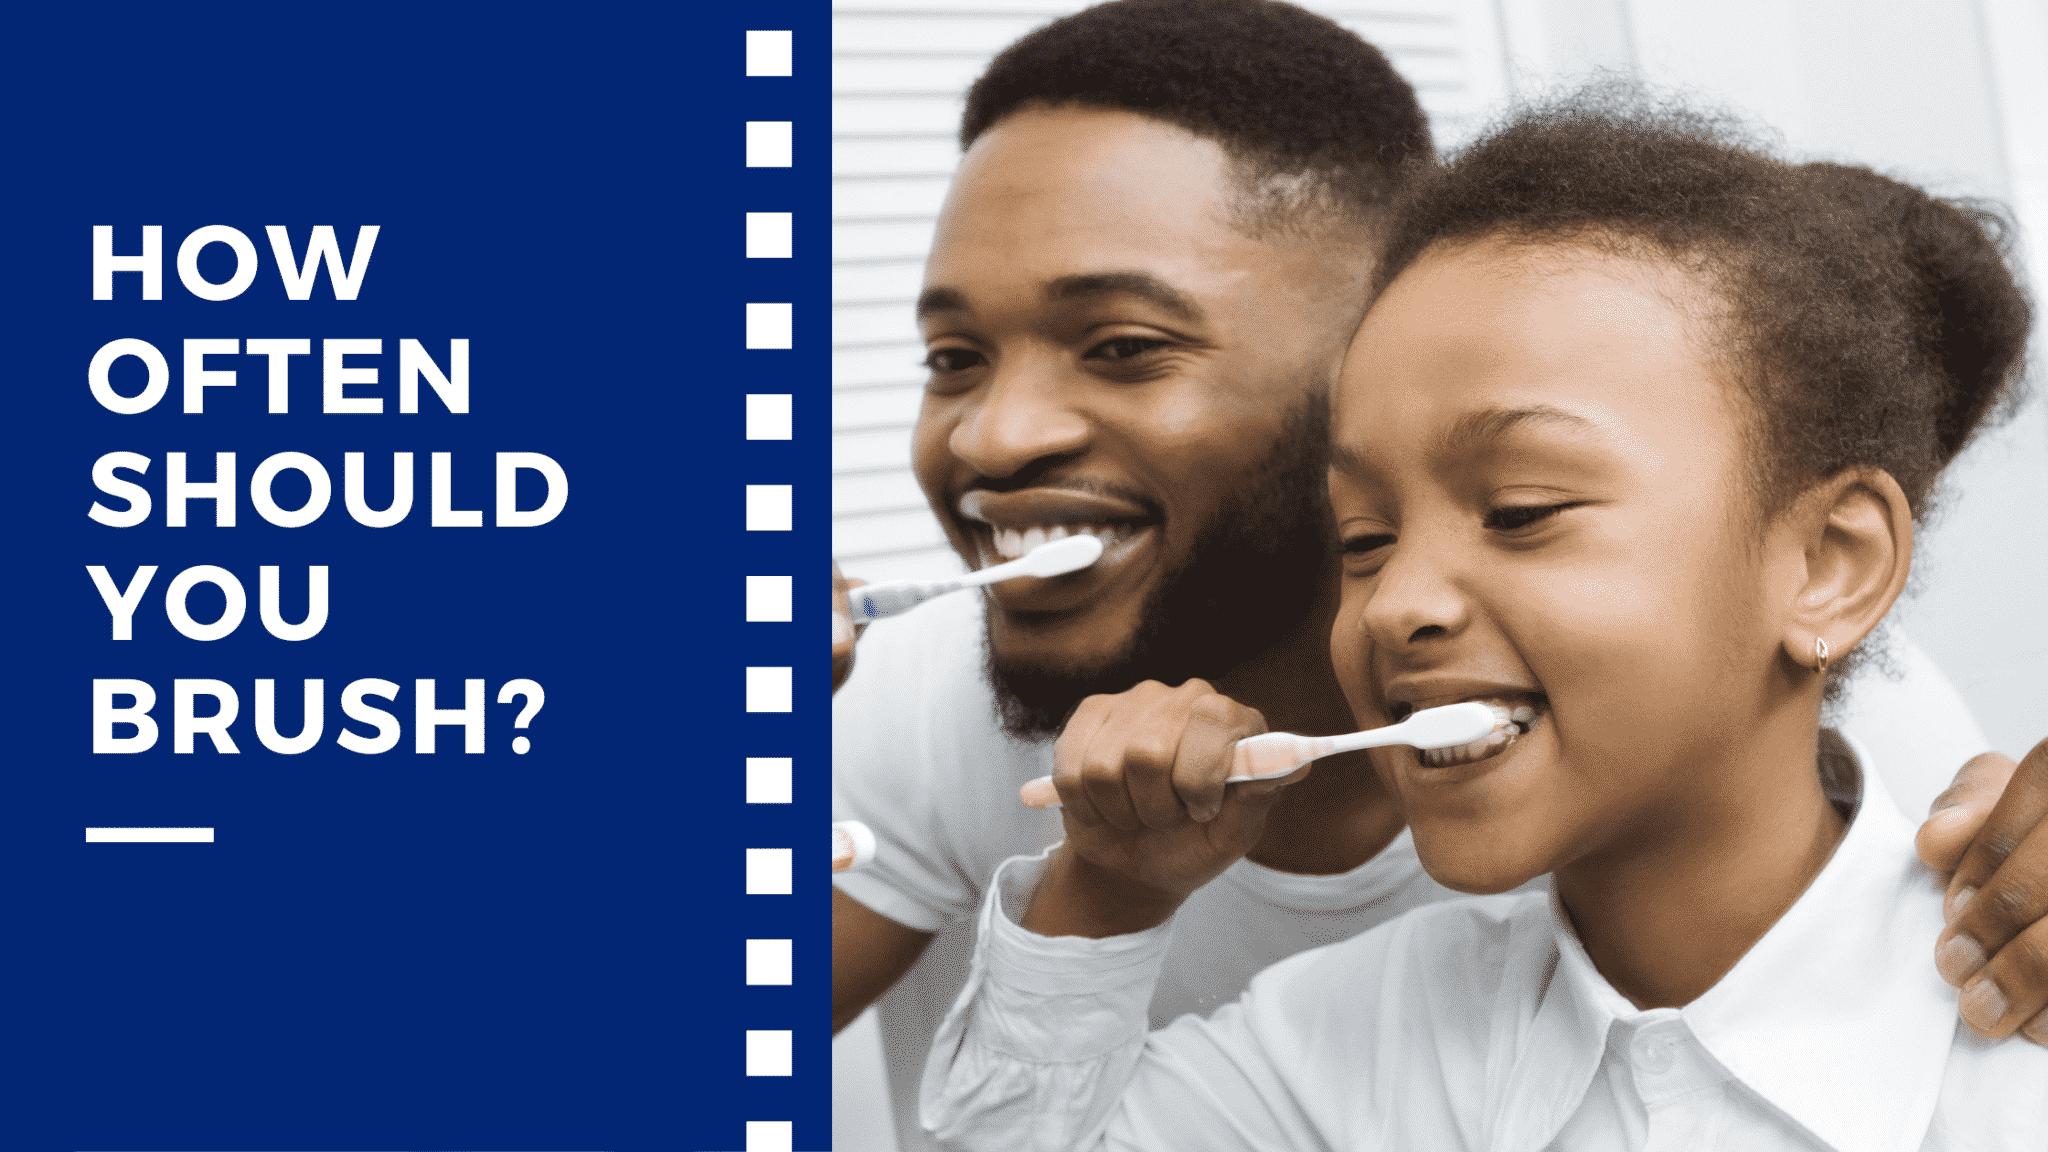 How often should you brush?